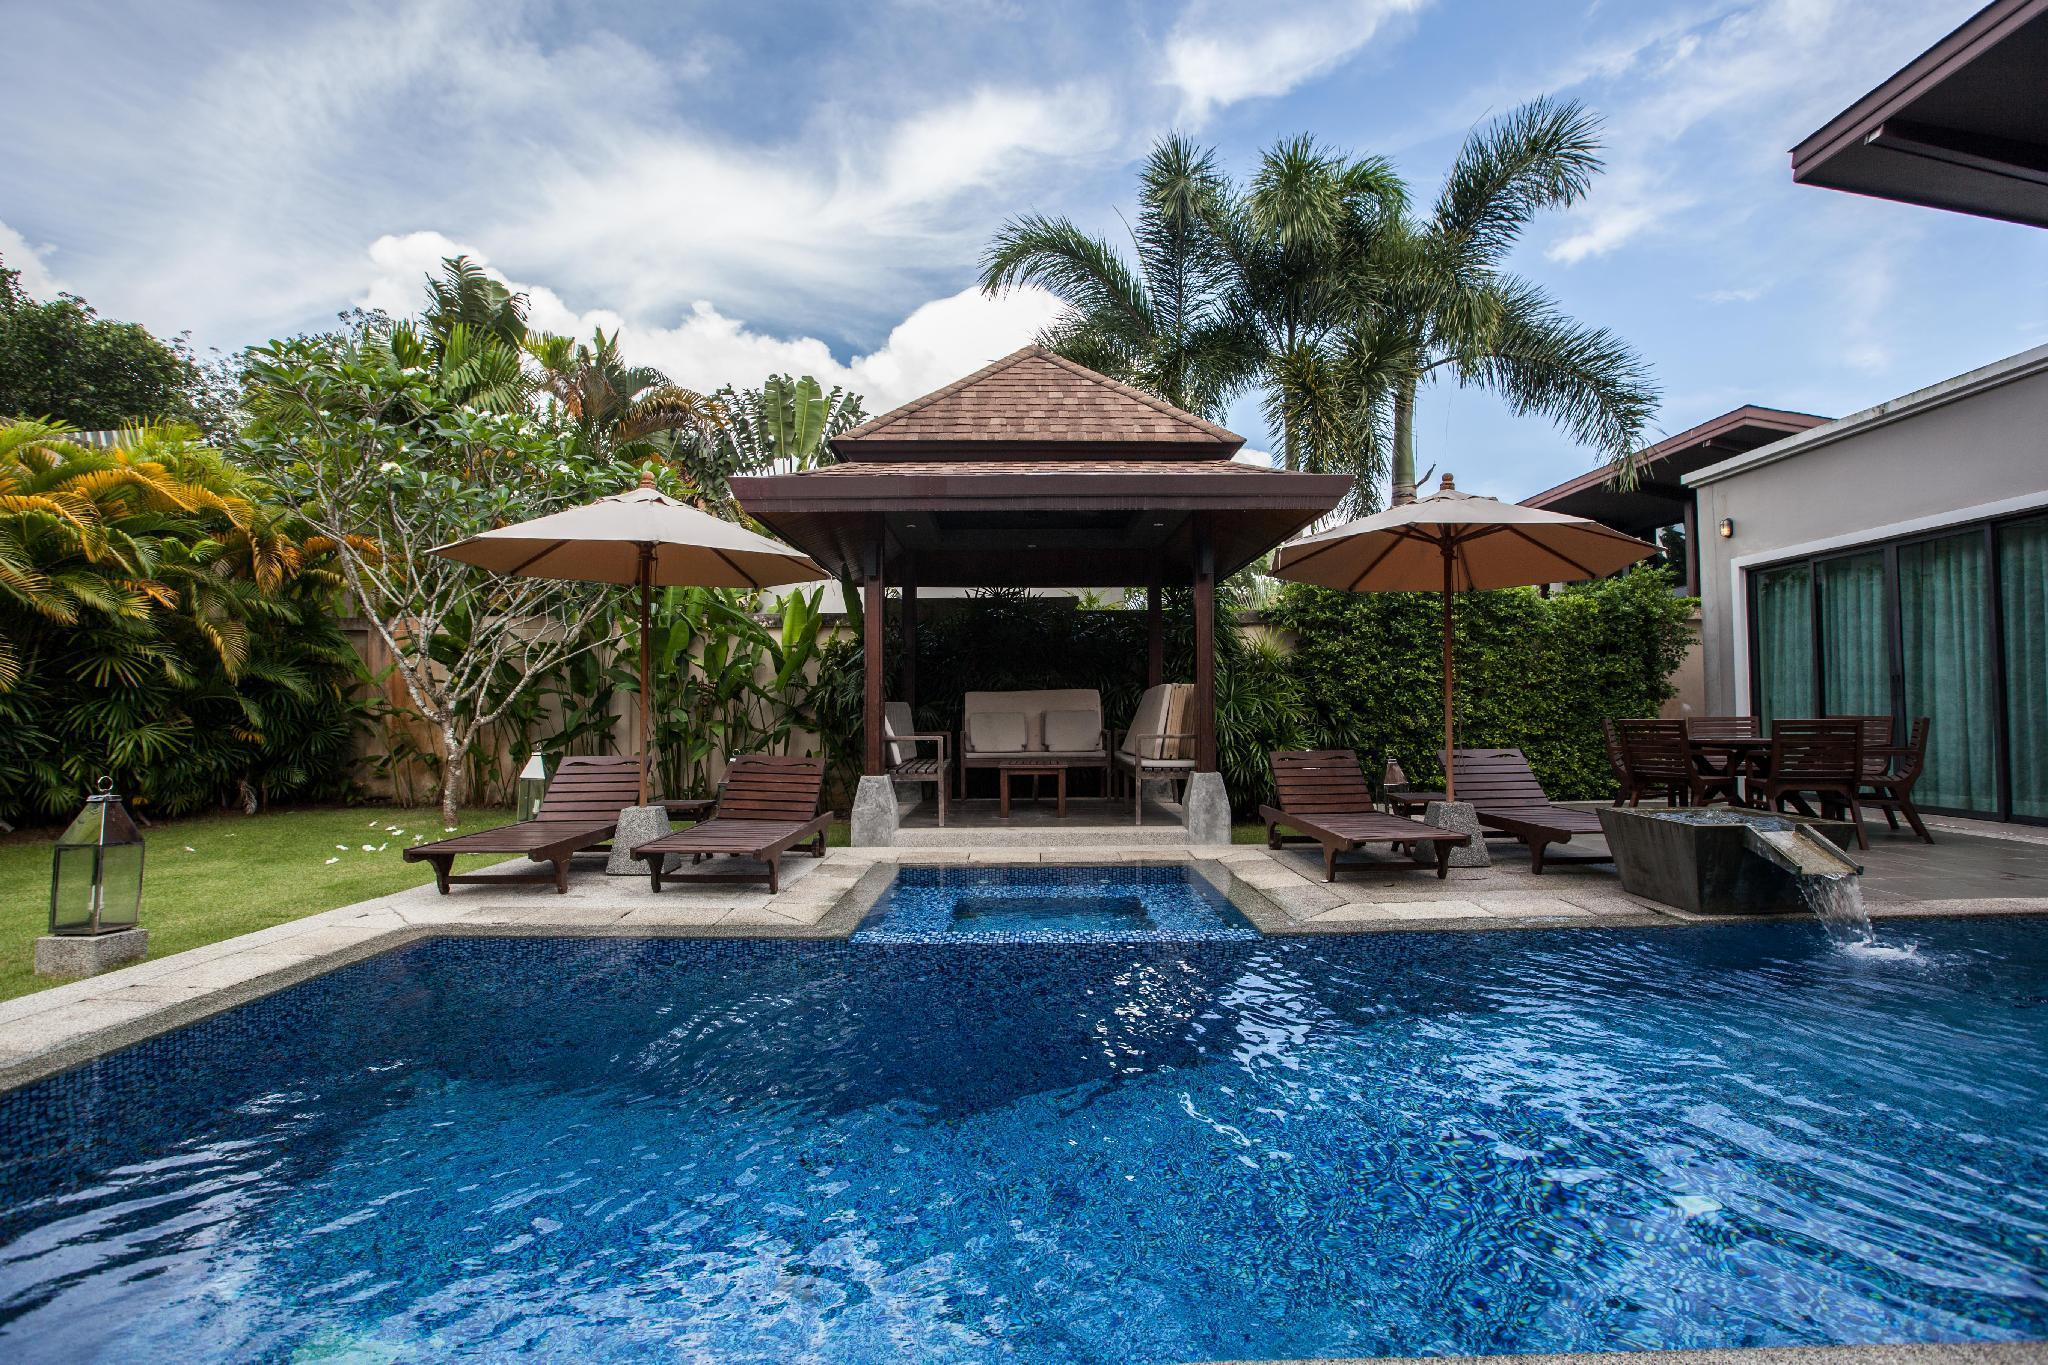 Luxury Villa Baan Vana 3 bed with pool วิลลา 3 ห้องนอน 2 ห้องน้ำส่วนตัว ขนาด 180 ตร.ม. – บางเทา